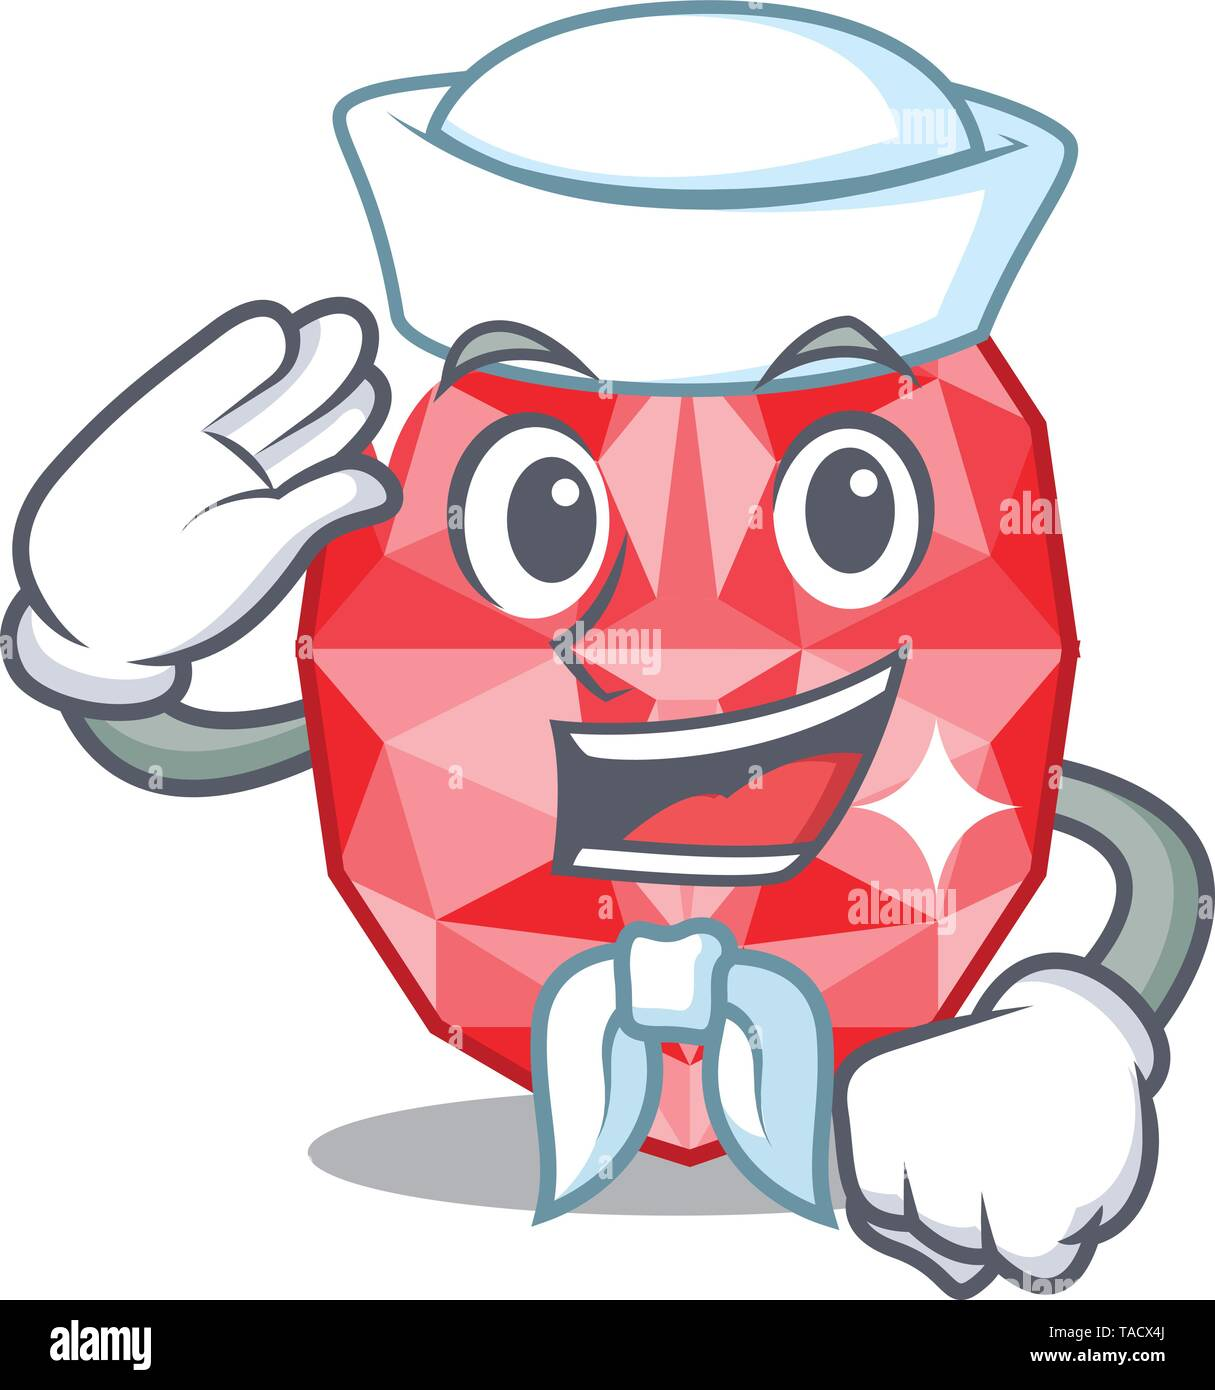 Sailor ruby gems in a cartoon box - Stock Image